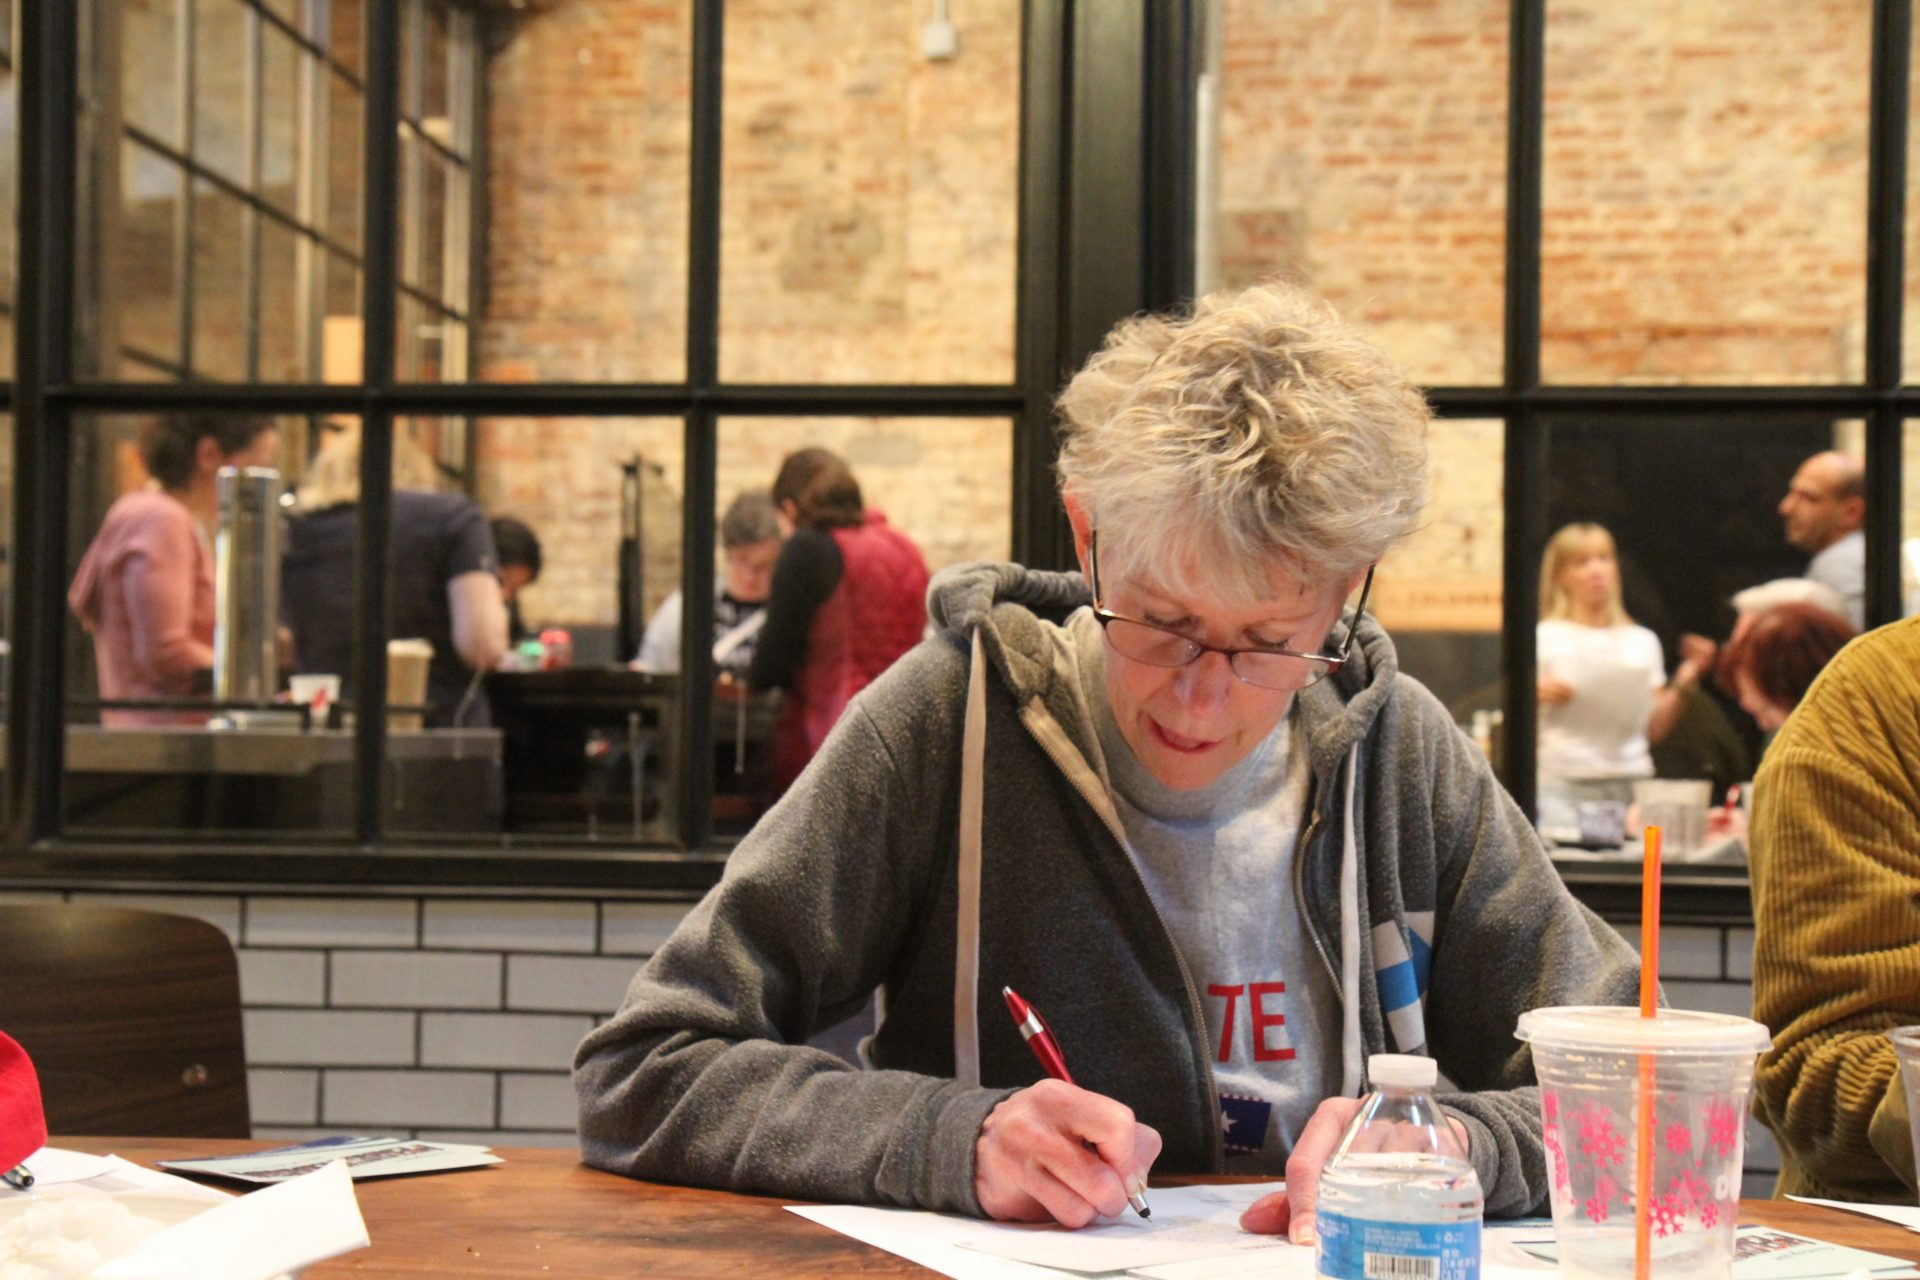 Elaine Griffin makes her pitch for Sen. Elizabeth Warren to Iowa caucus-goers via postcard